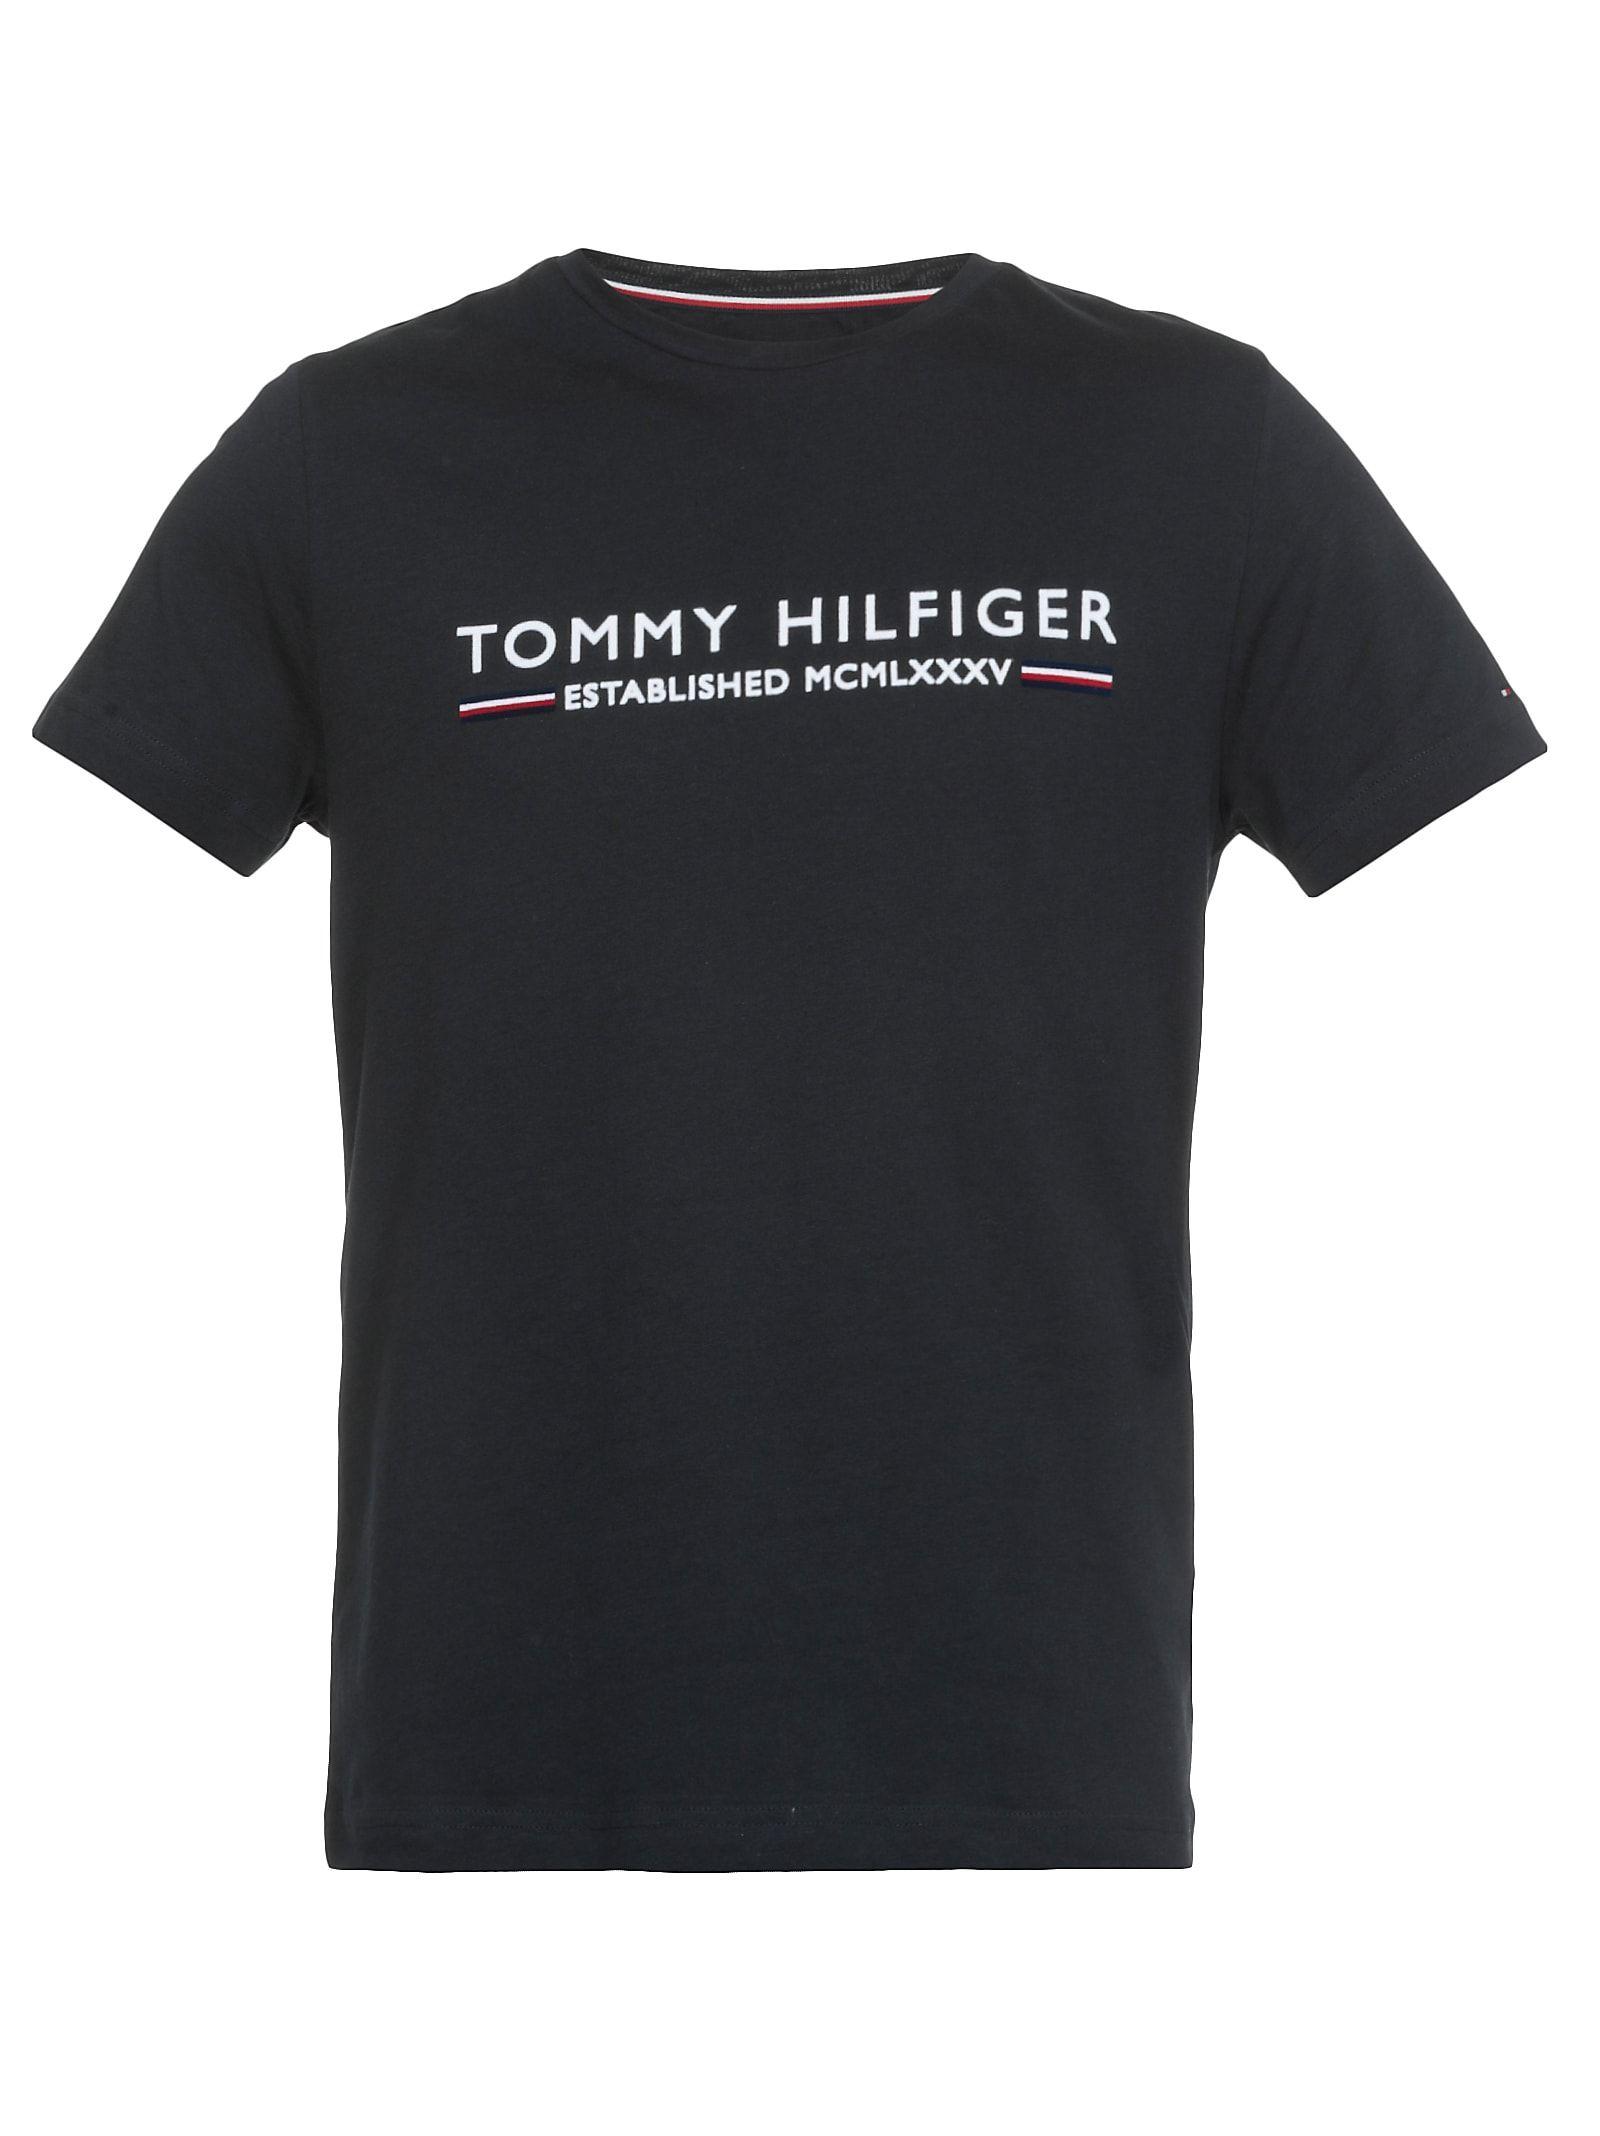 Tommy Hilfiger Tjw Small Logo Text tee Camiseta para Mujer